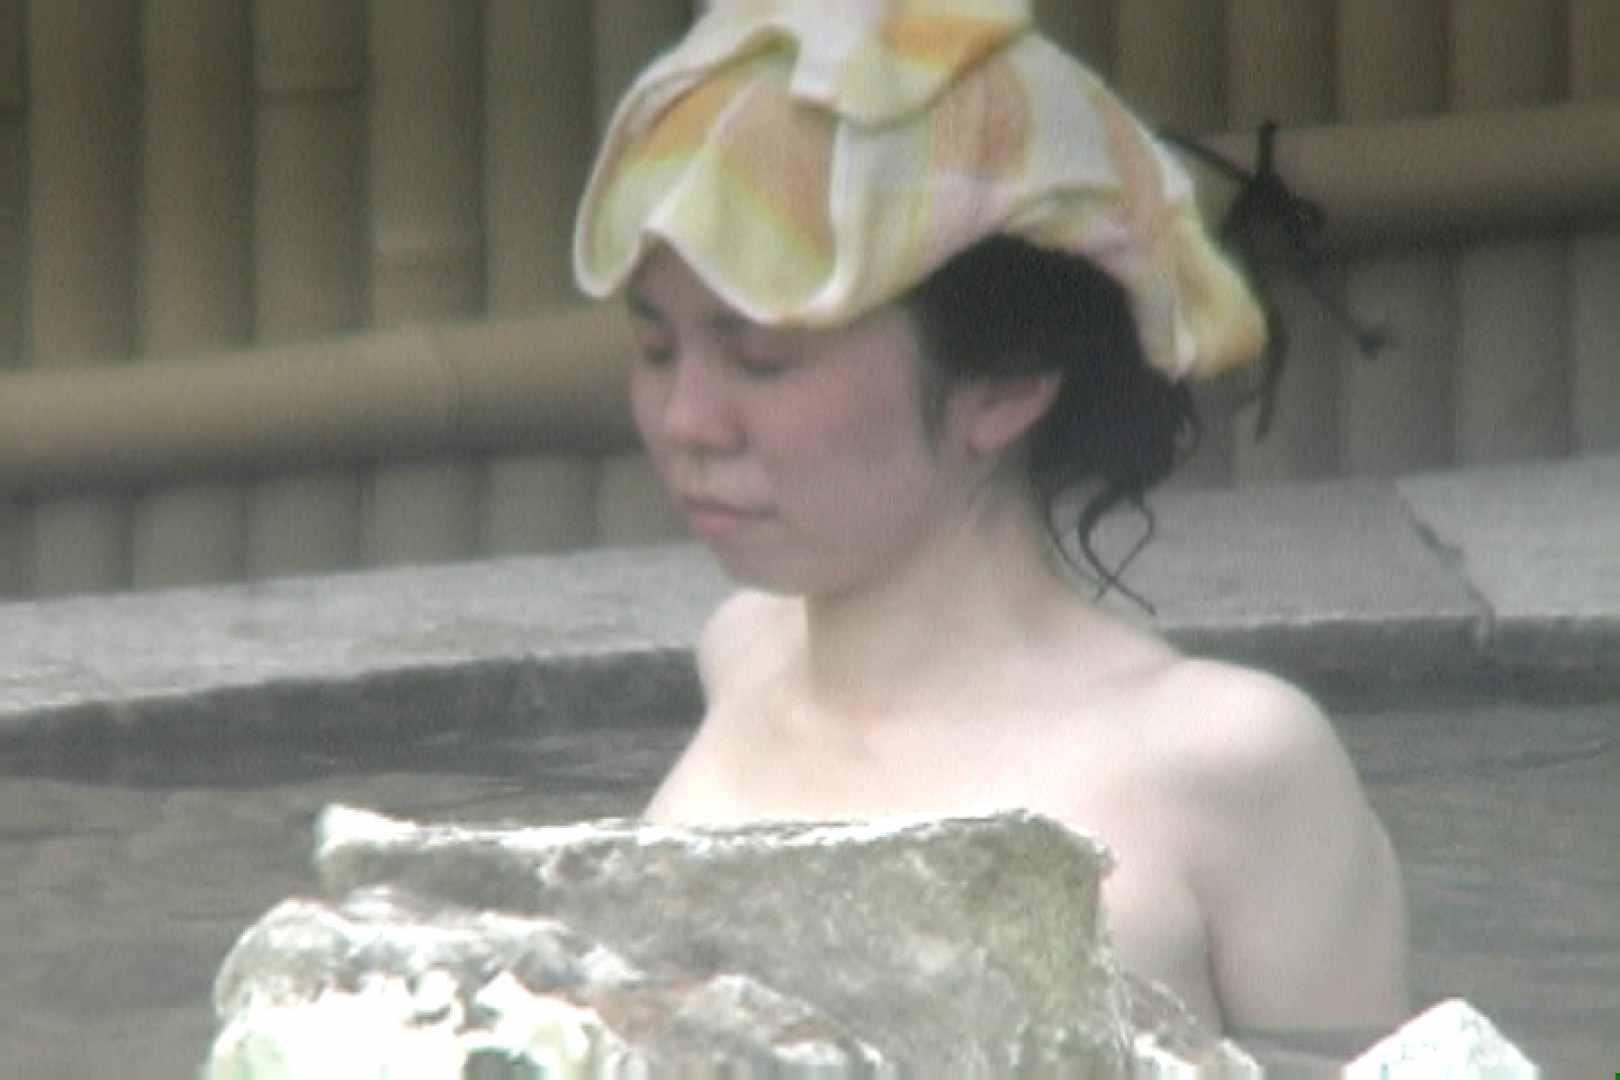 Aquaな露天風呂Vol.687 盗撮   OLセックス  63画像 22